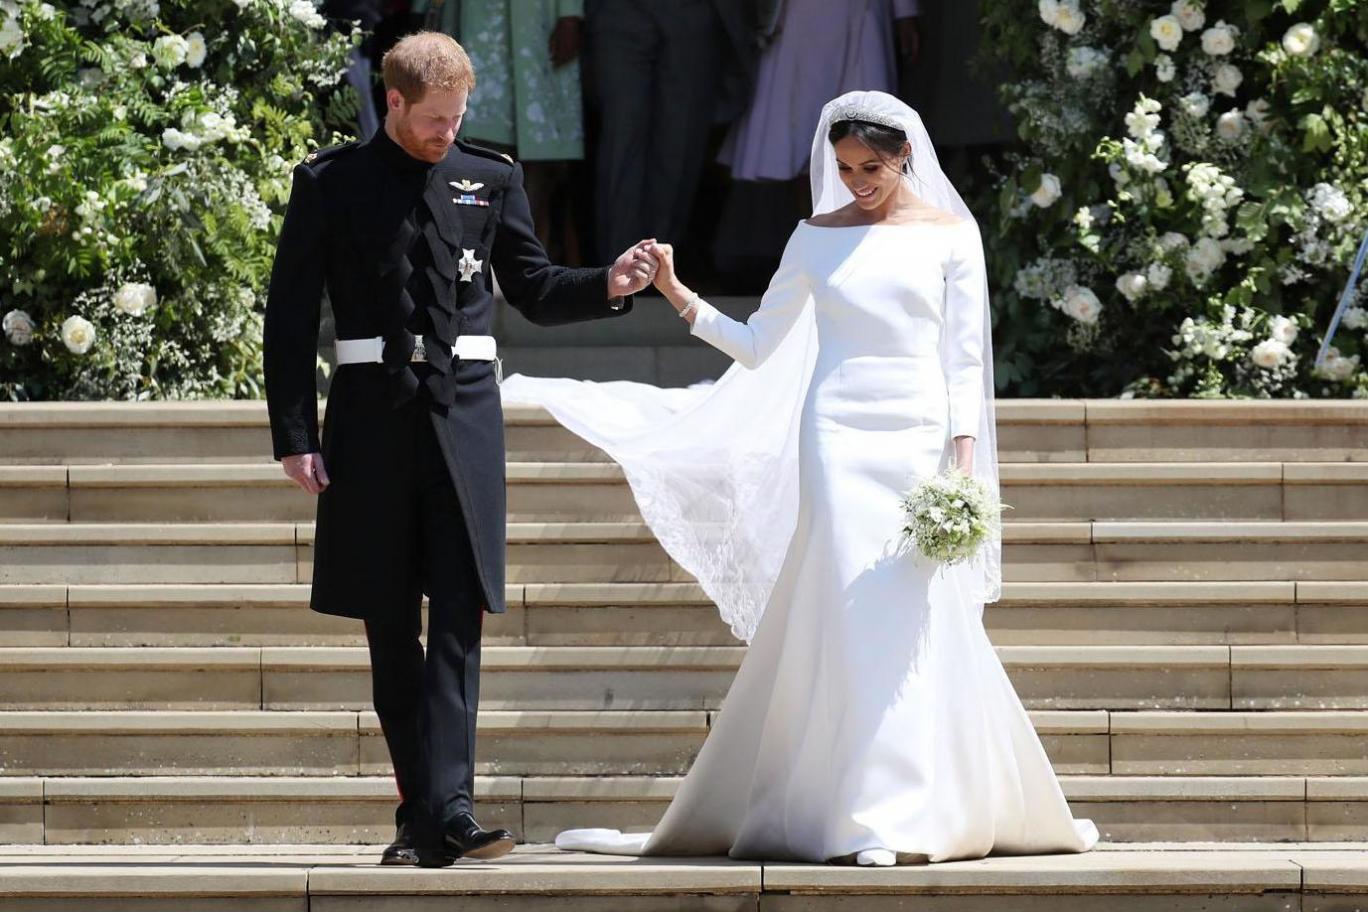 Meghan Markle wedding dress revealed: Prince Harry's bride wears bespoke Givenchy gown